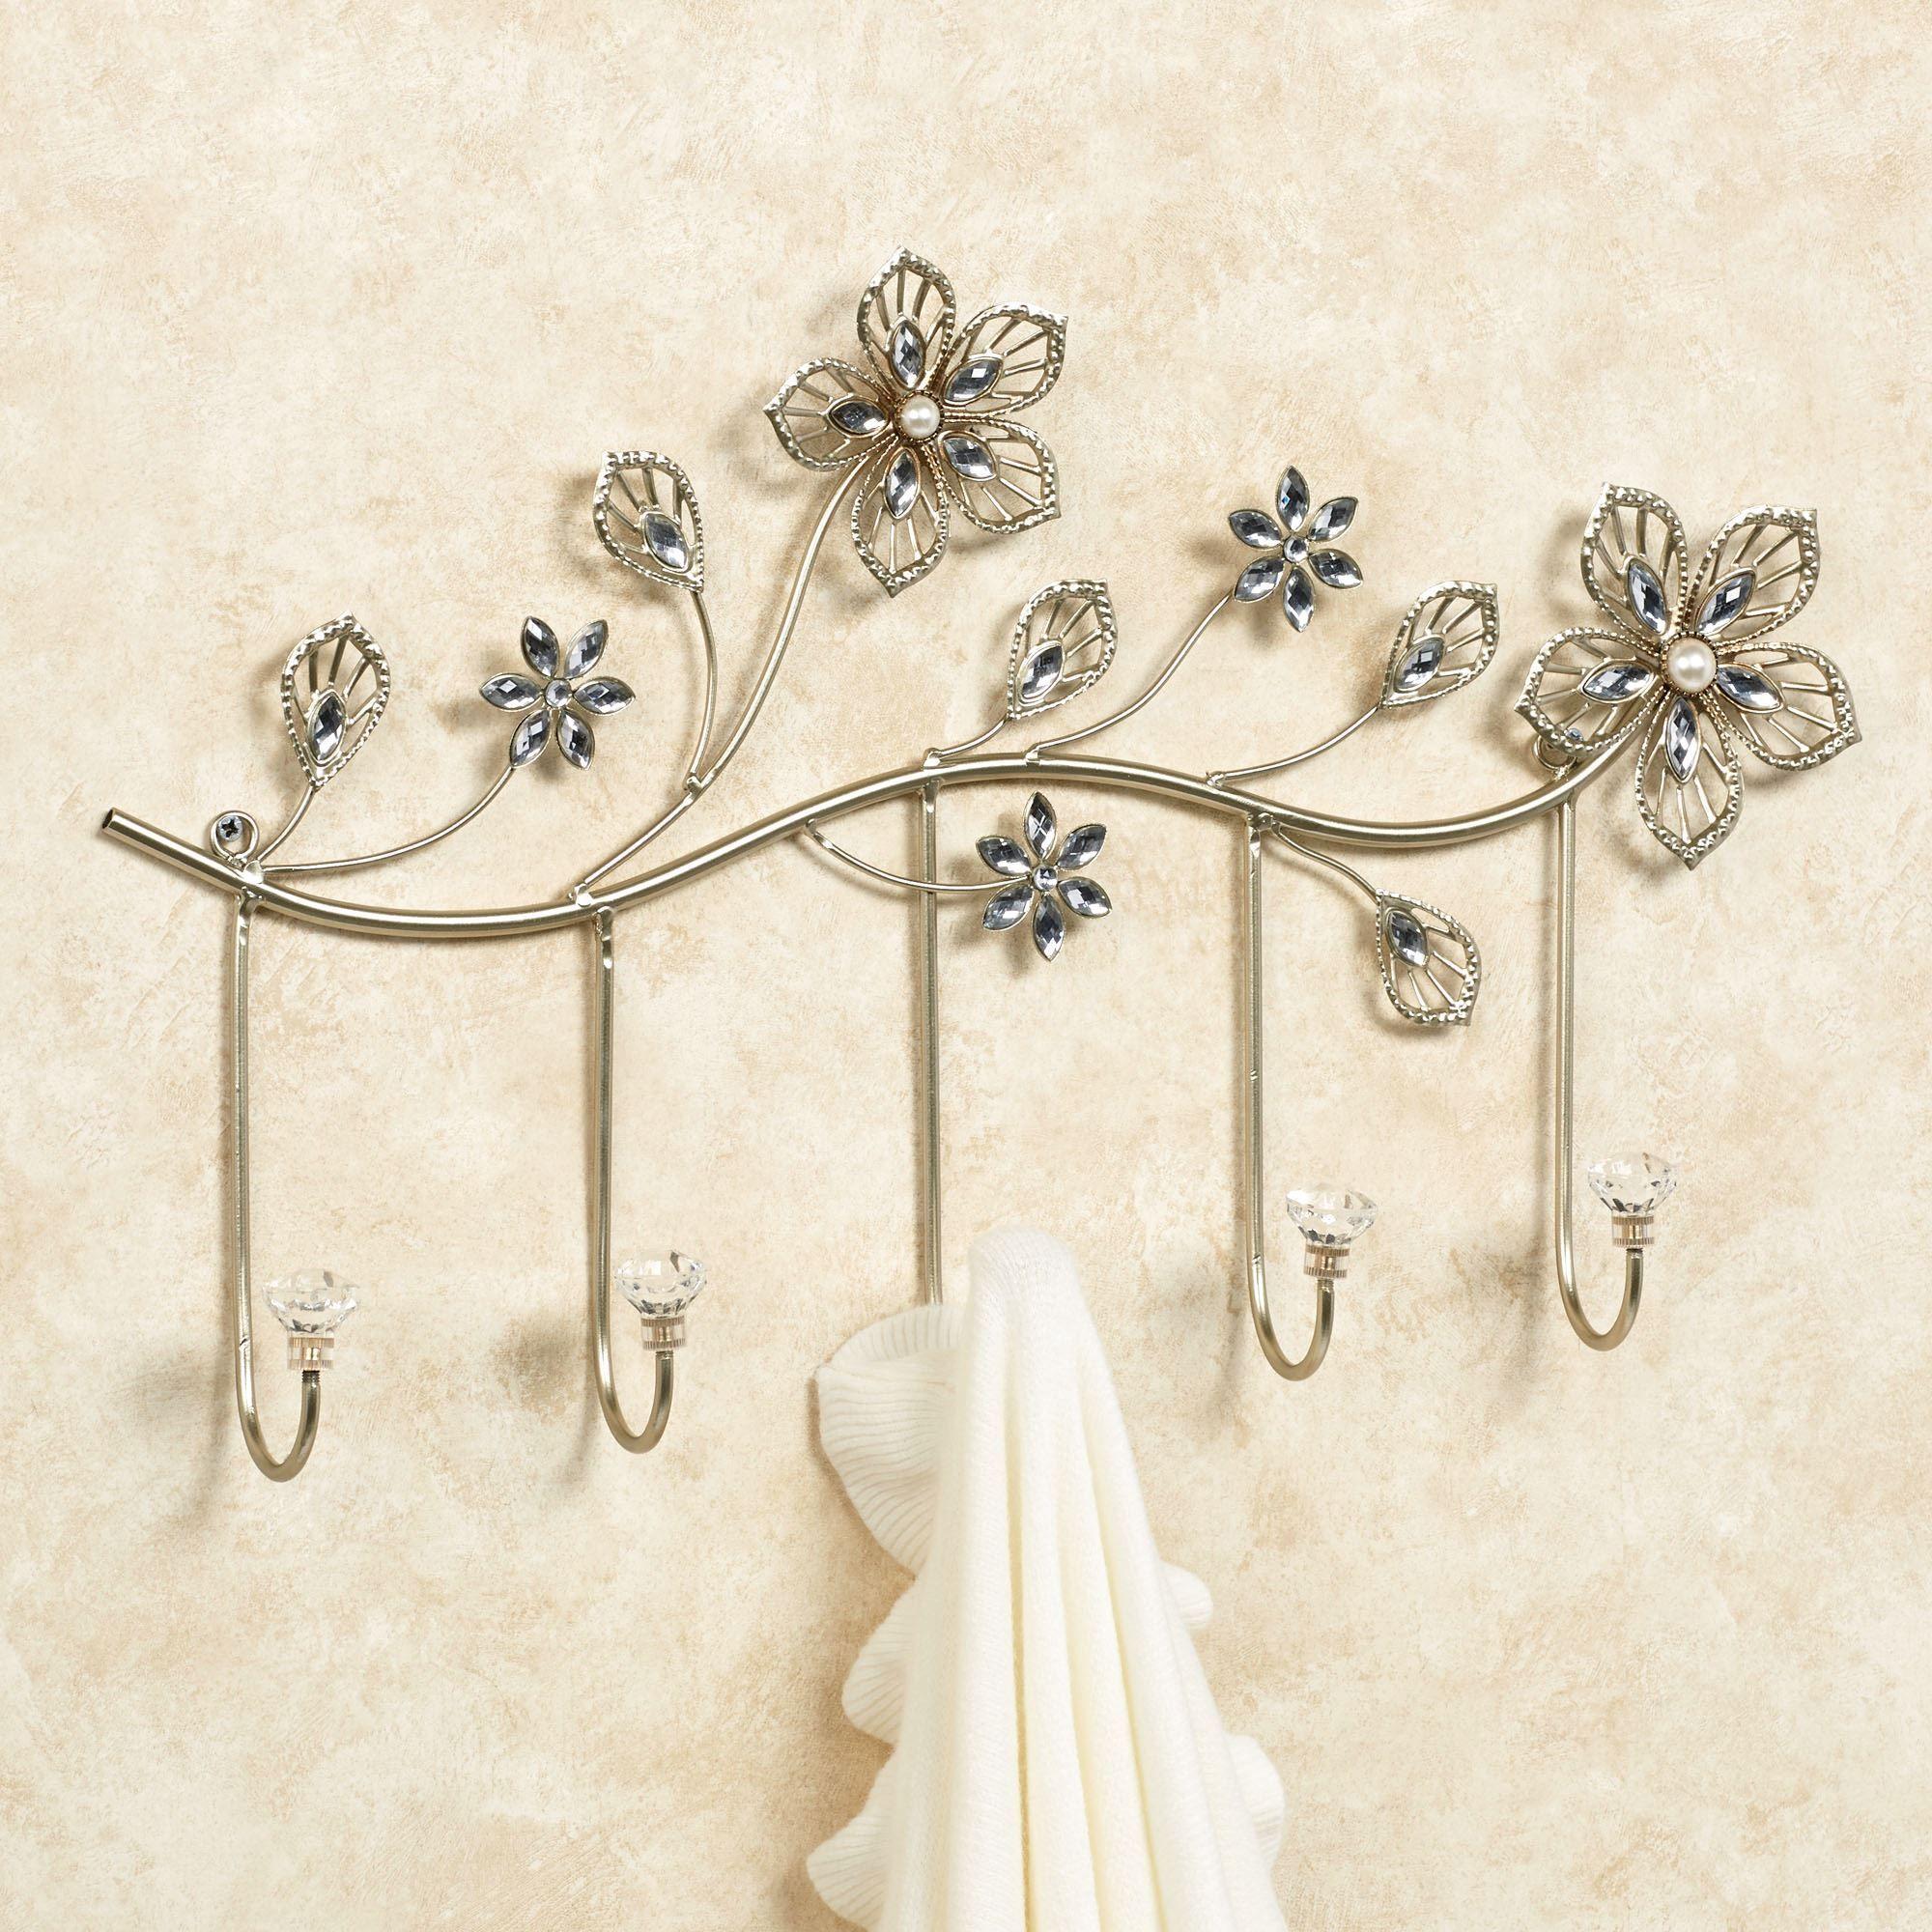 Rosianna Floral Wall Hook Rack